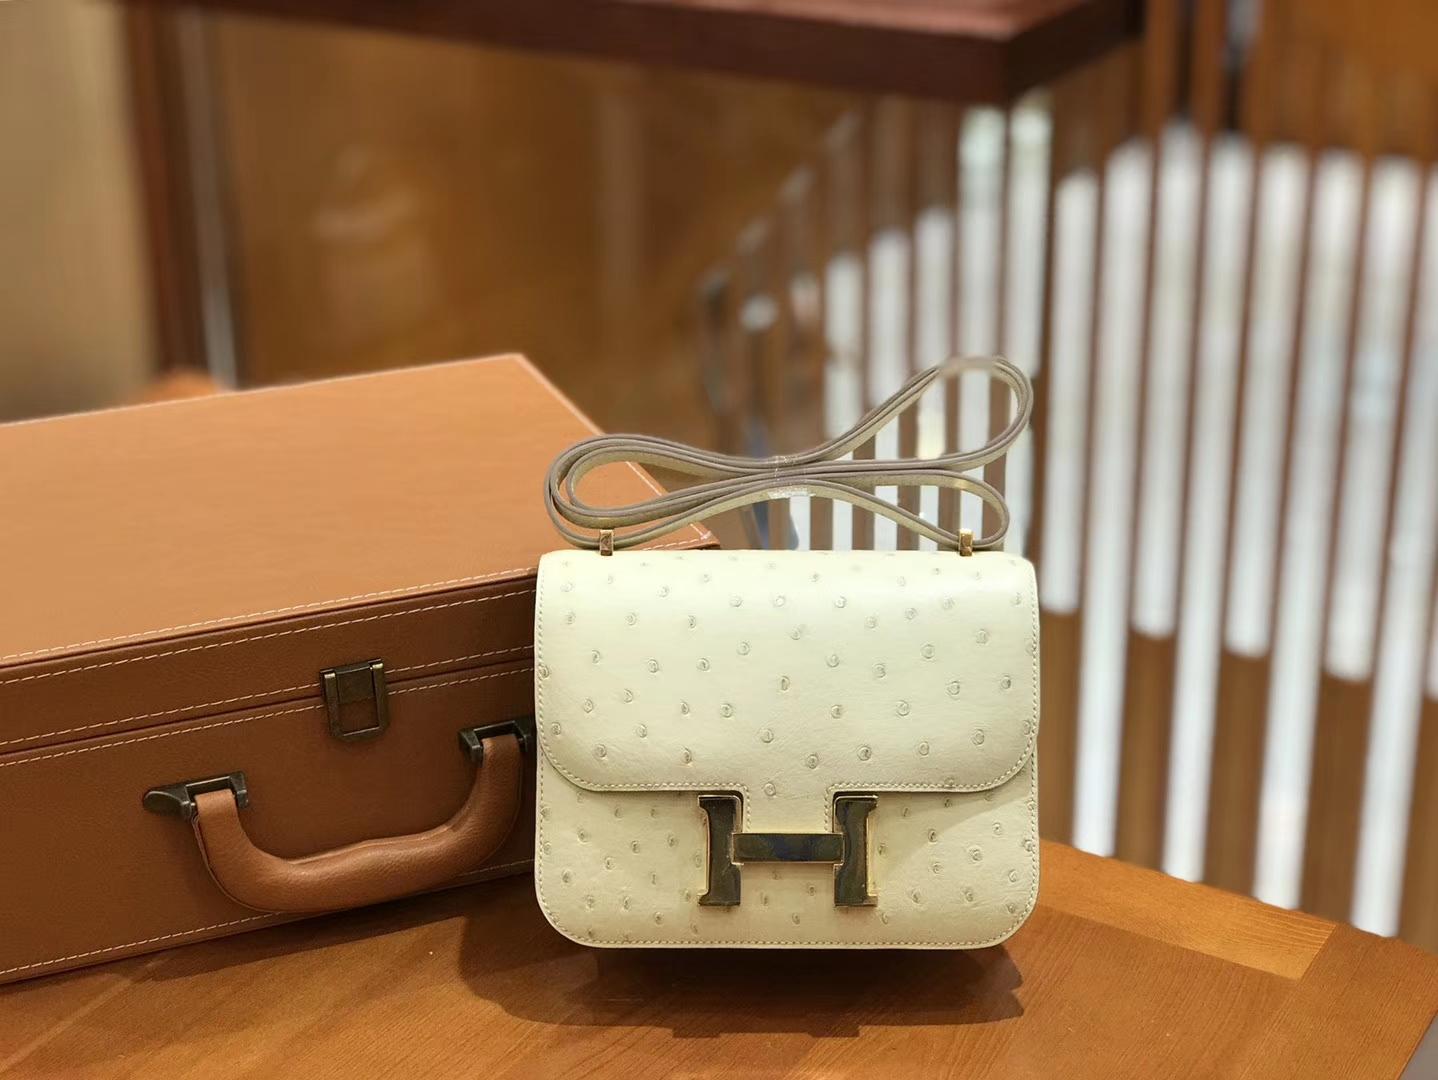 Hermès(爱马仕)Constance 18cm 鸵鸟皮 奶昔白 金扣 全手工缝制 现货